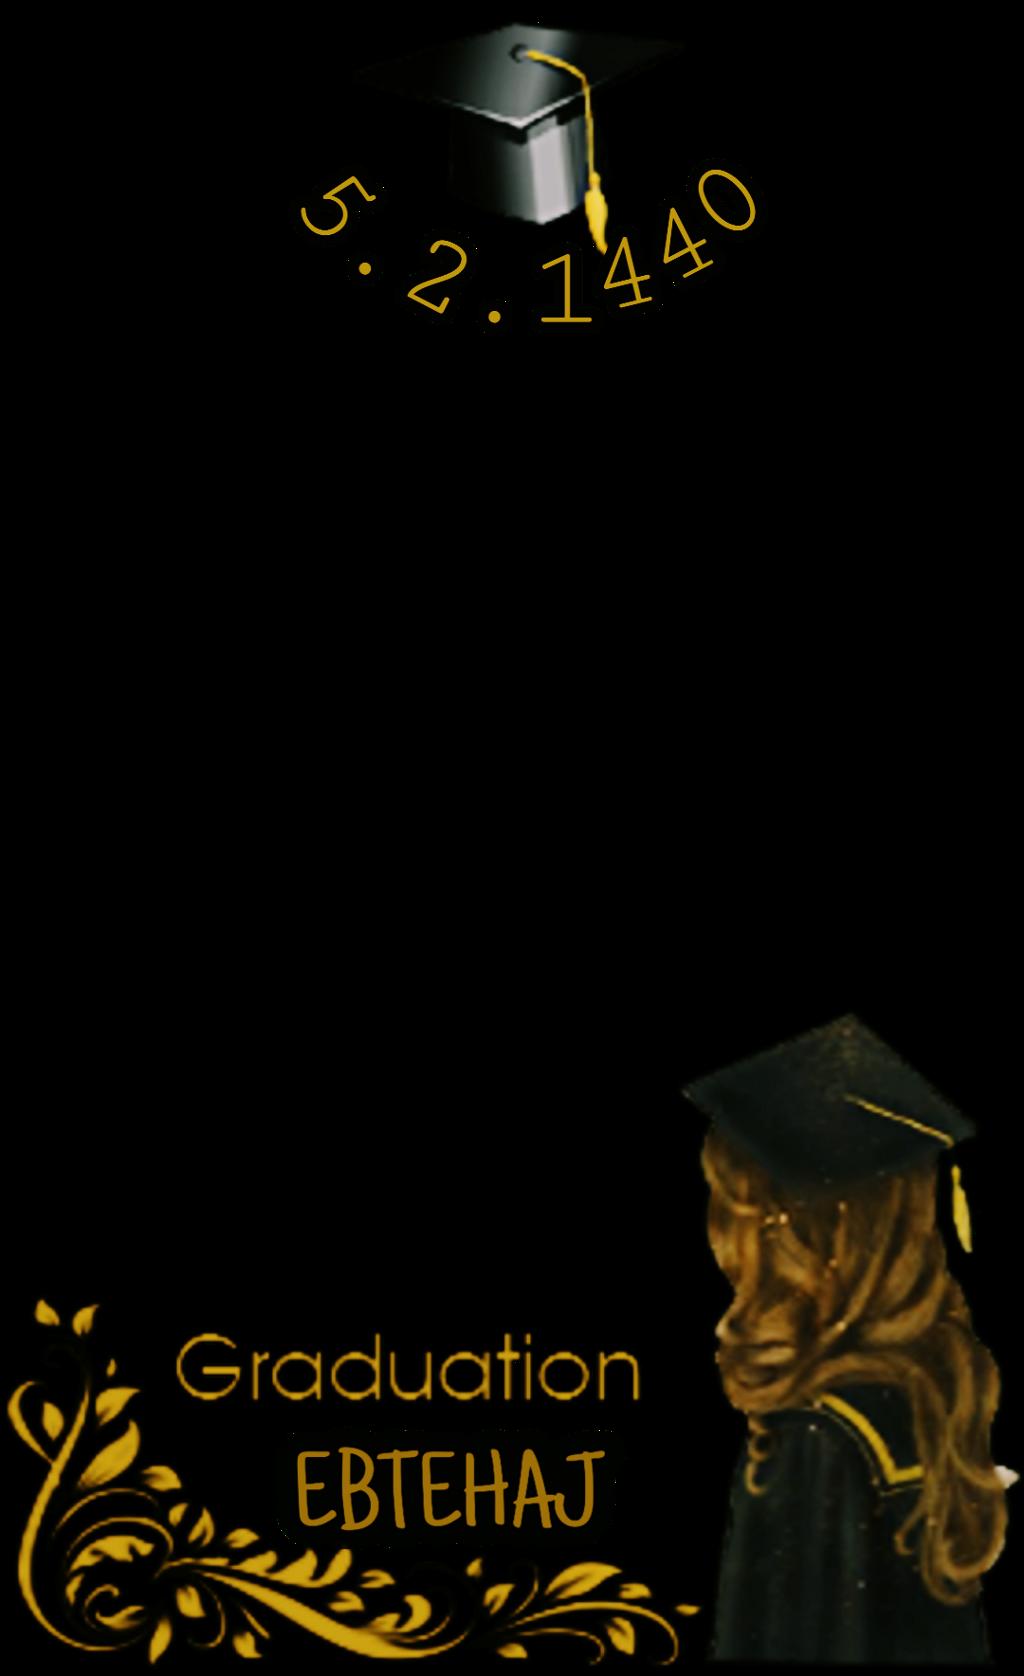 Happy graduation day freetoedit